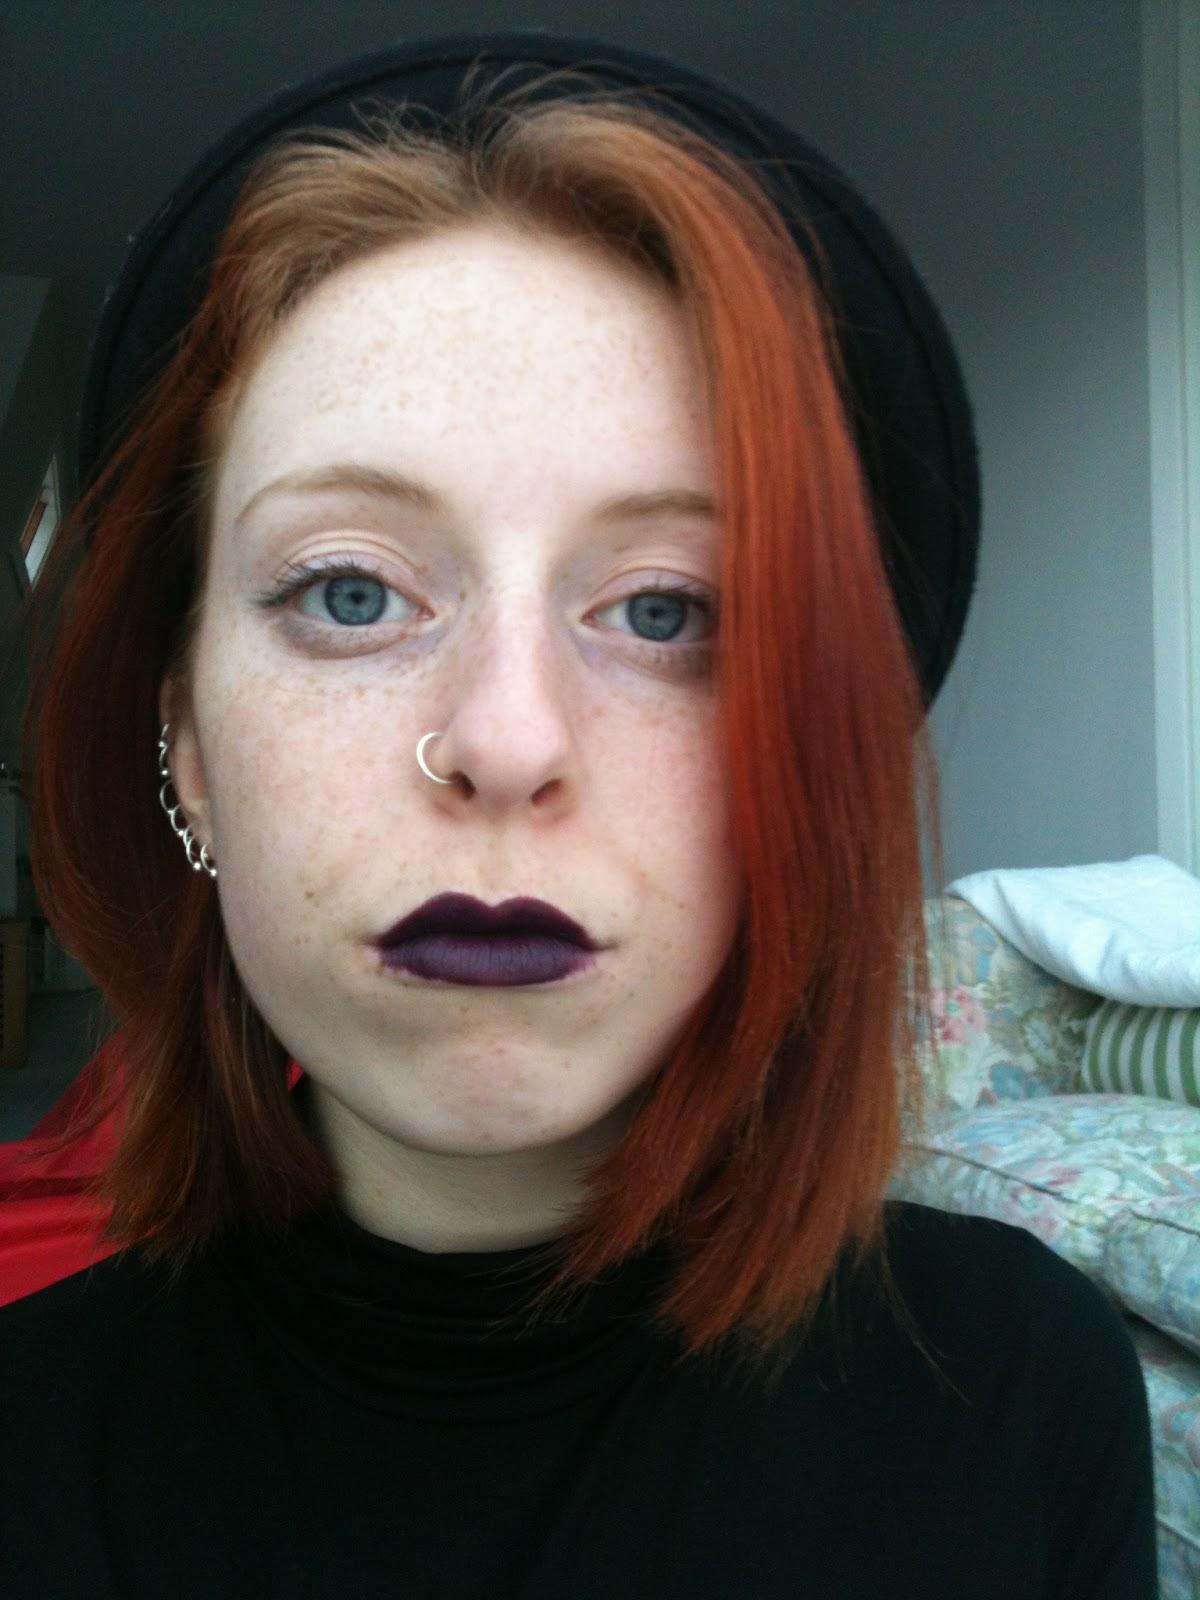 Lipstick Fantasy: Mac Dark Lipsticks Haul!